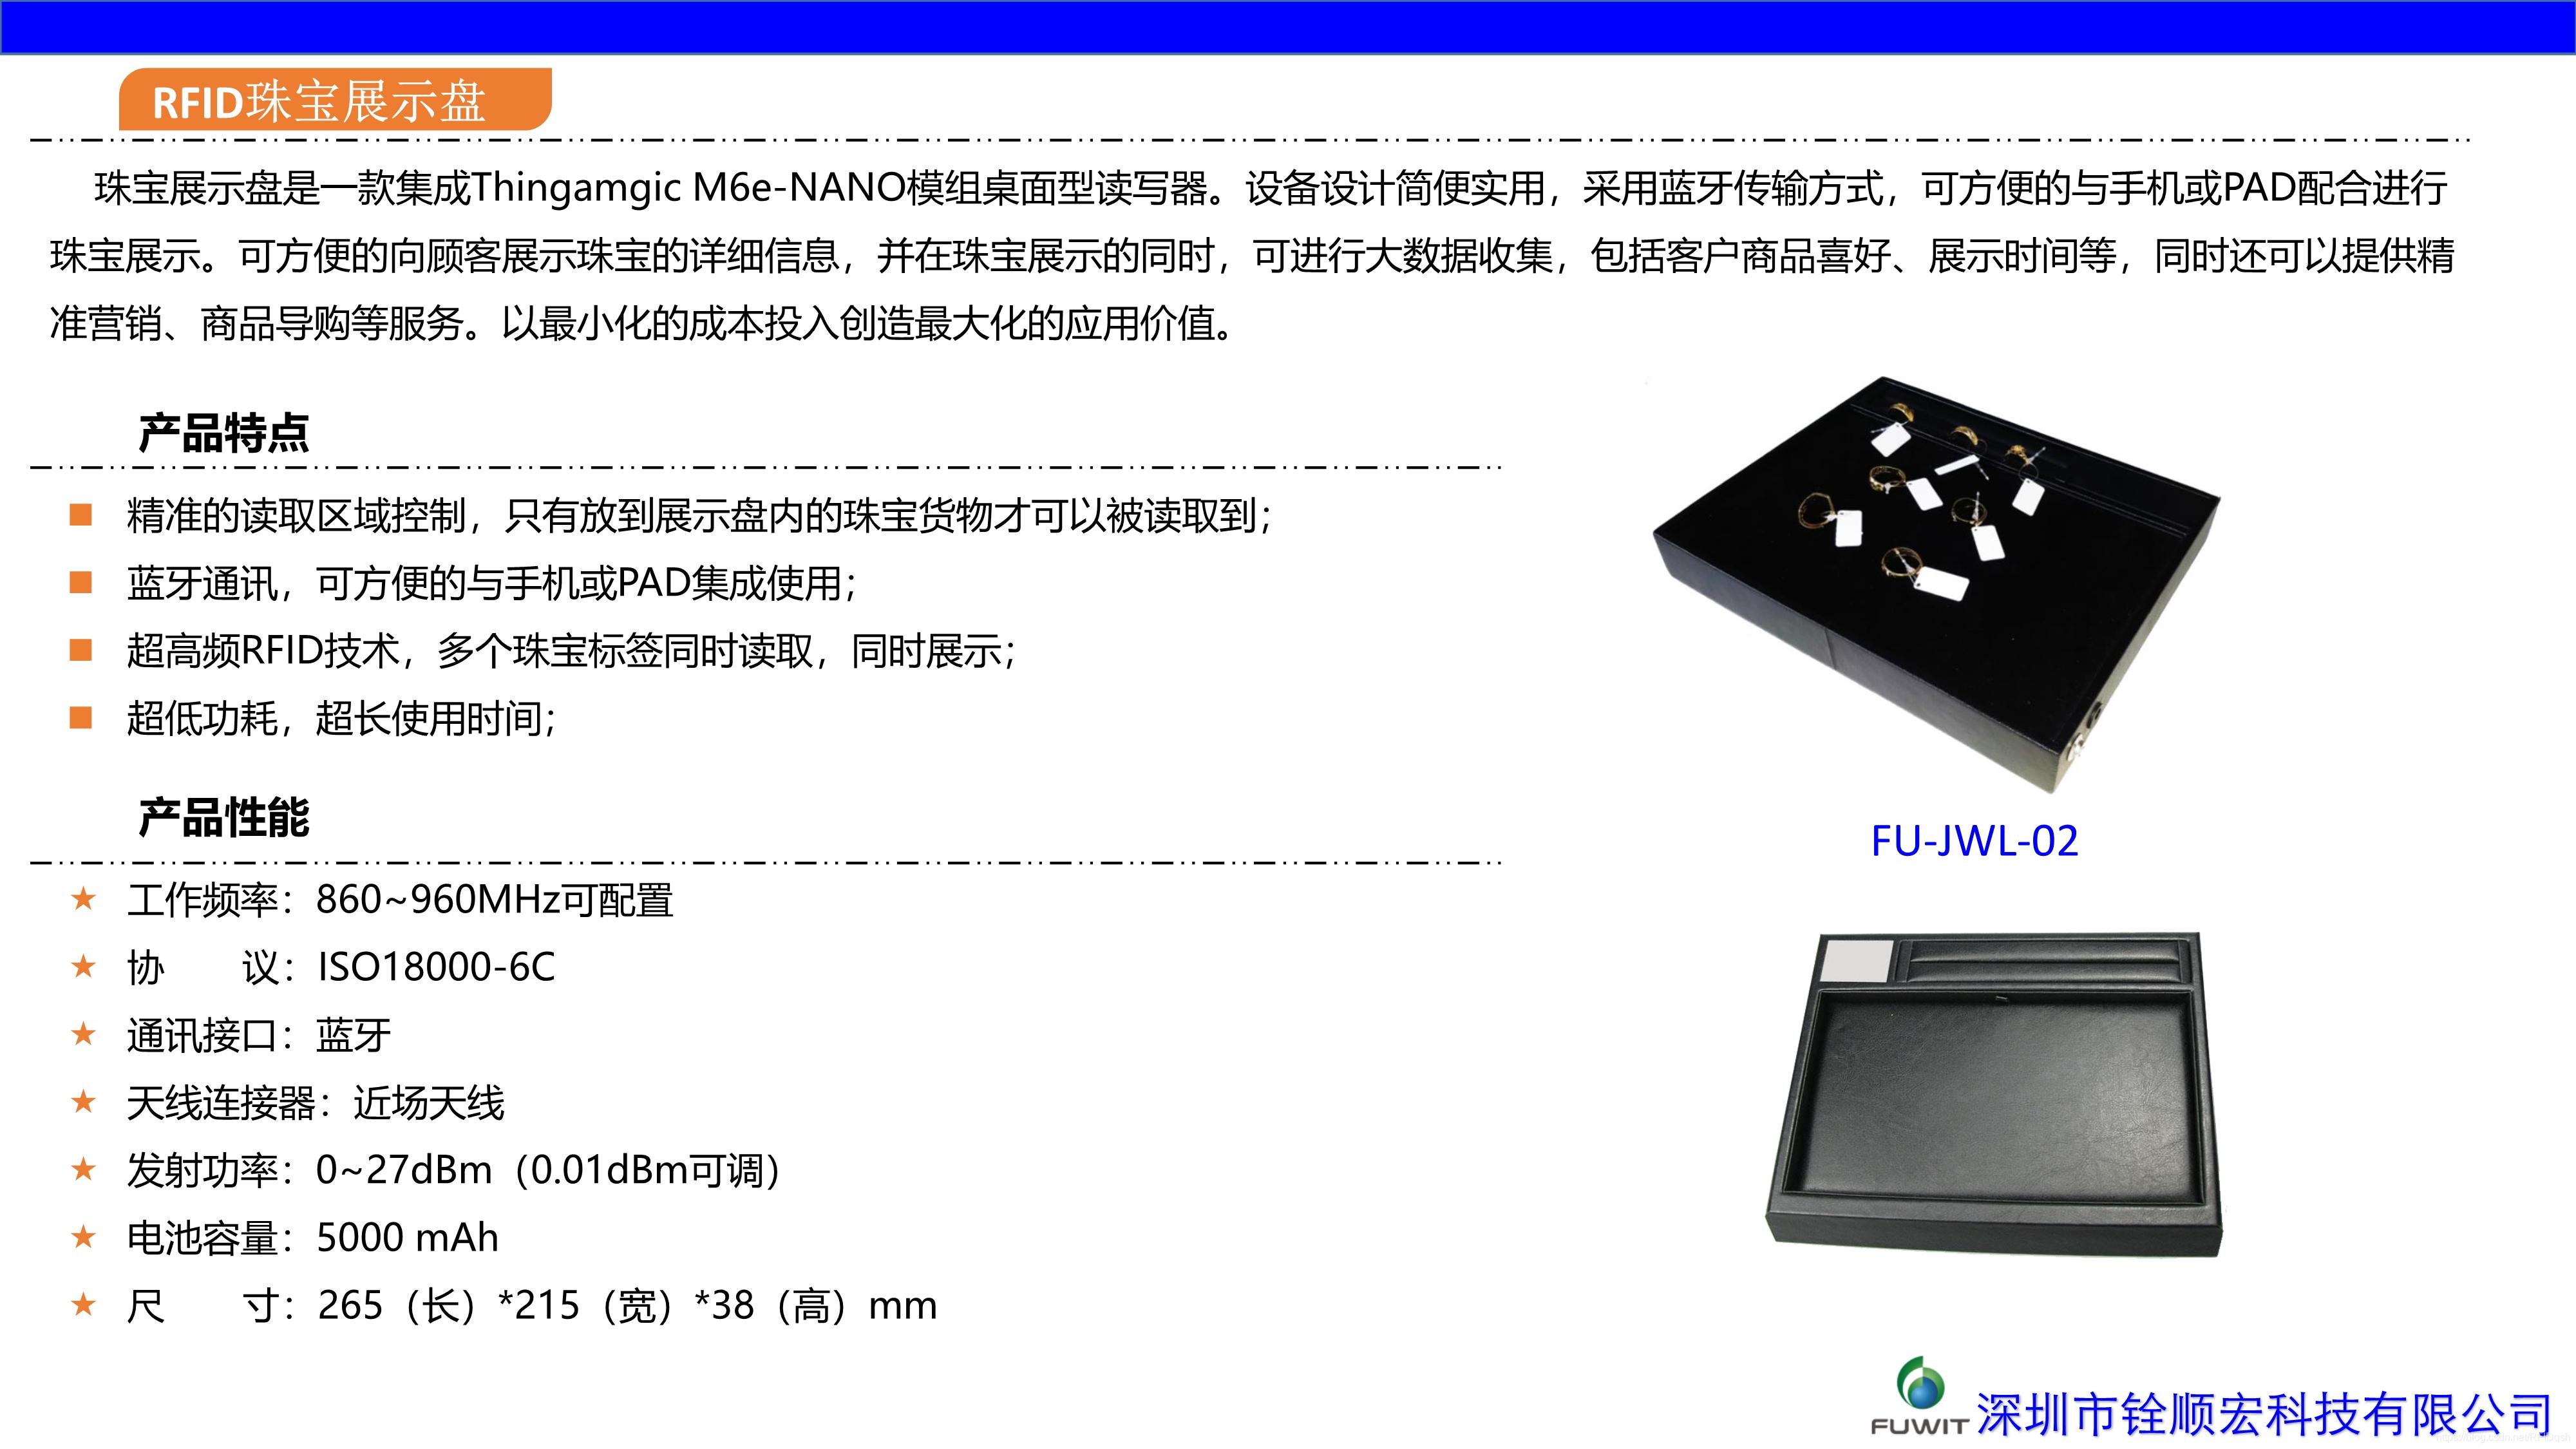 RFID珠宝展示盘